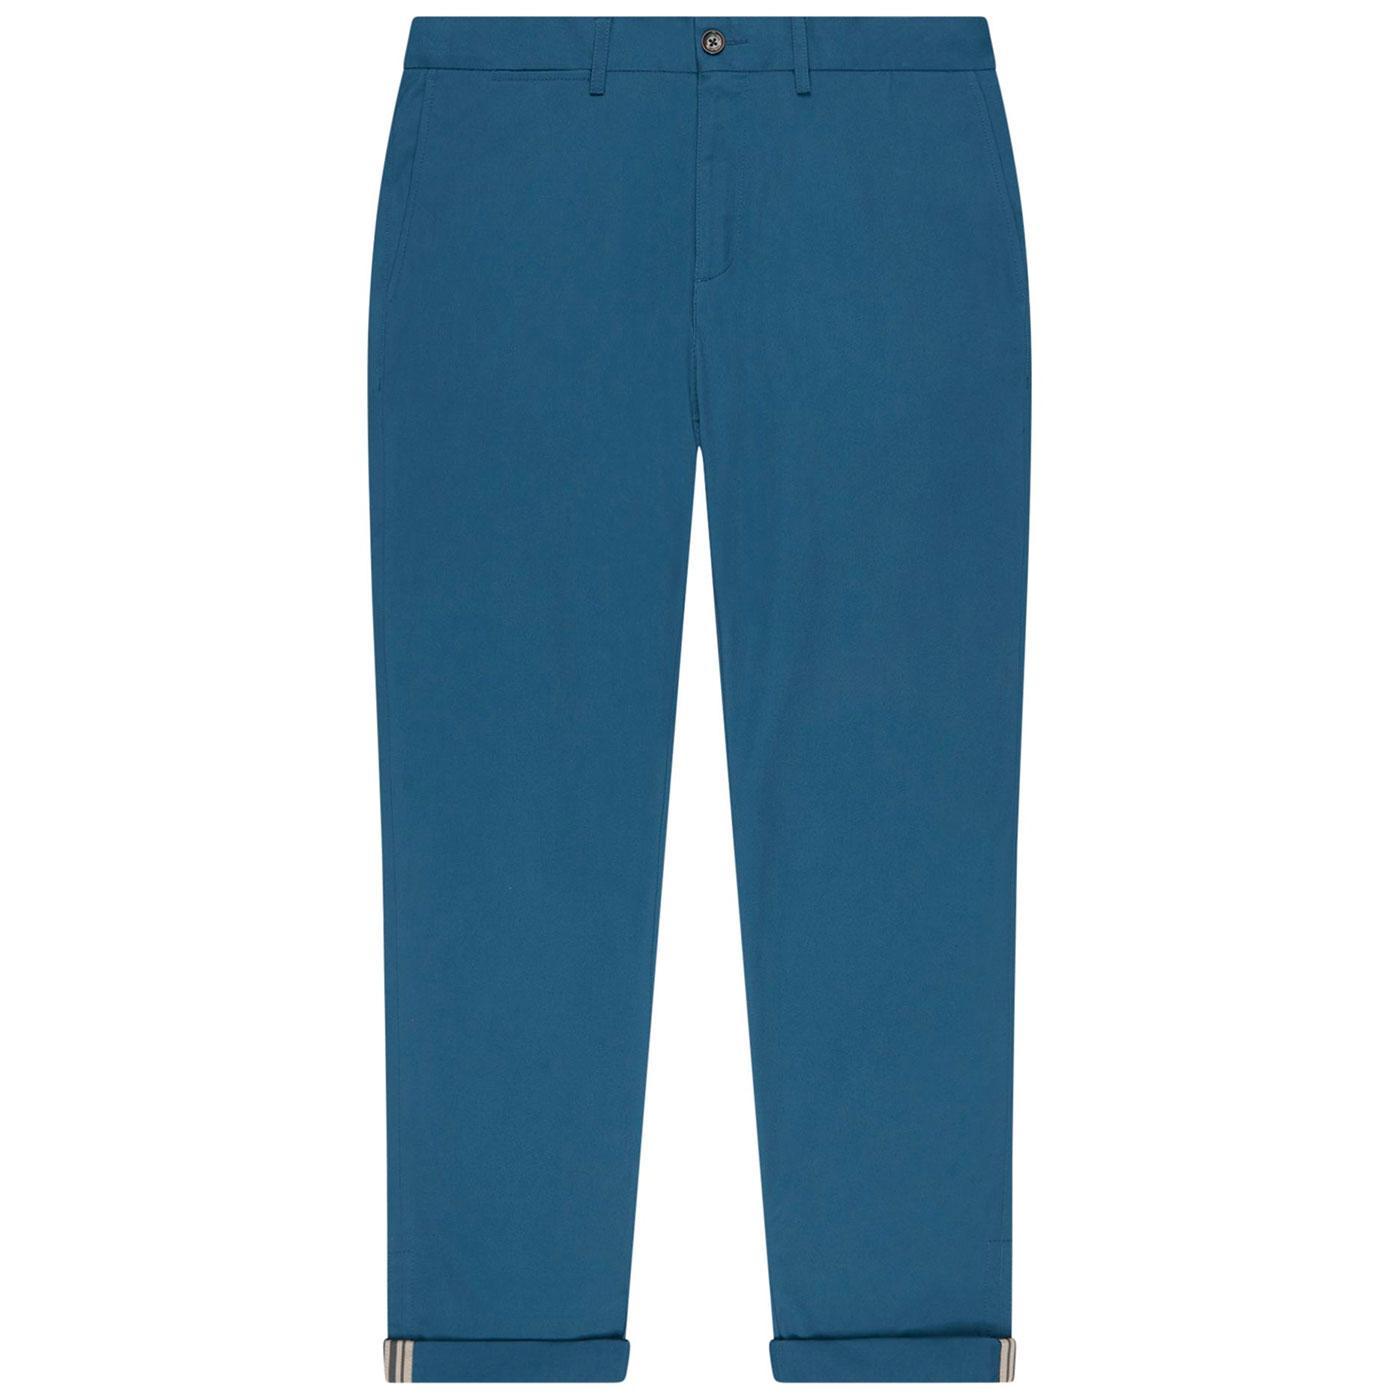 BEN SHERMAN Mens Signature Chino Trousers - Indigo